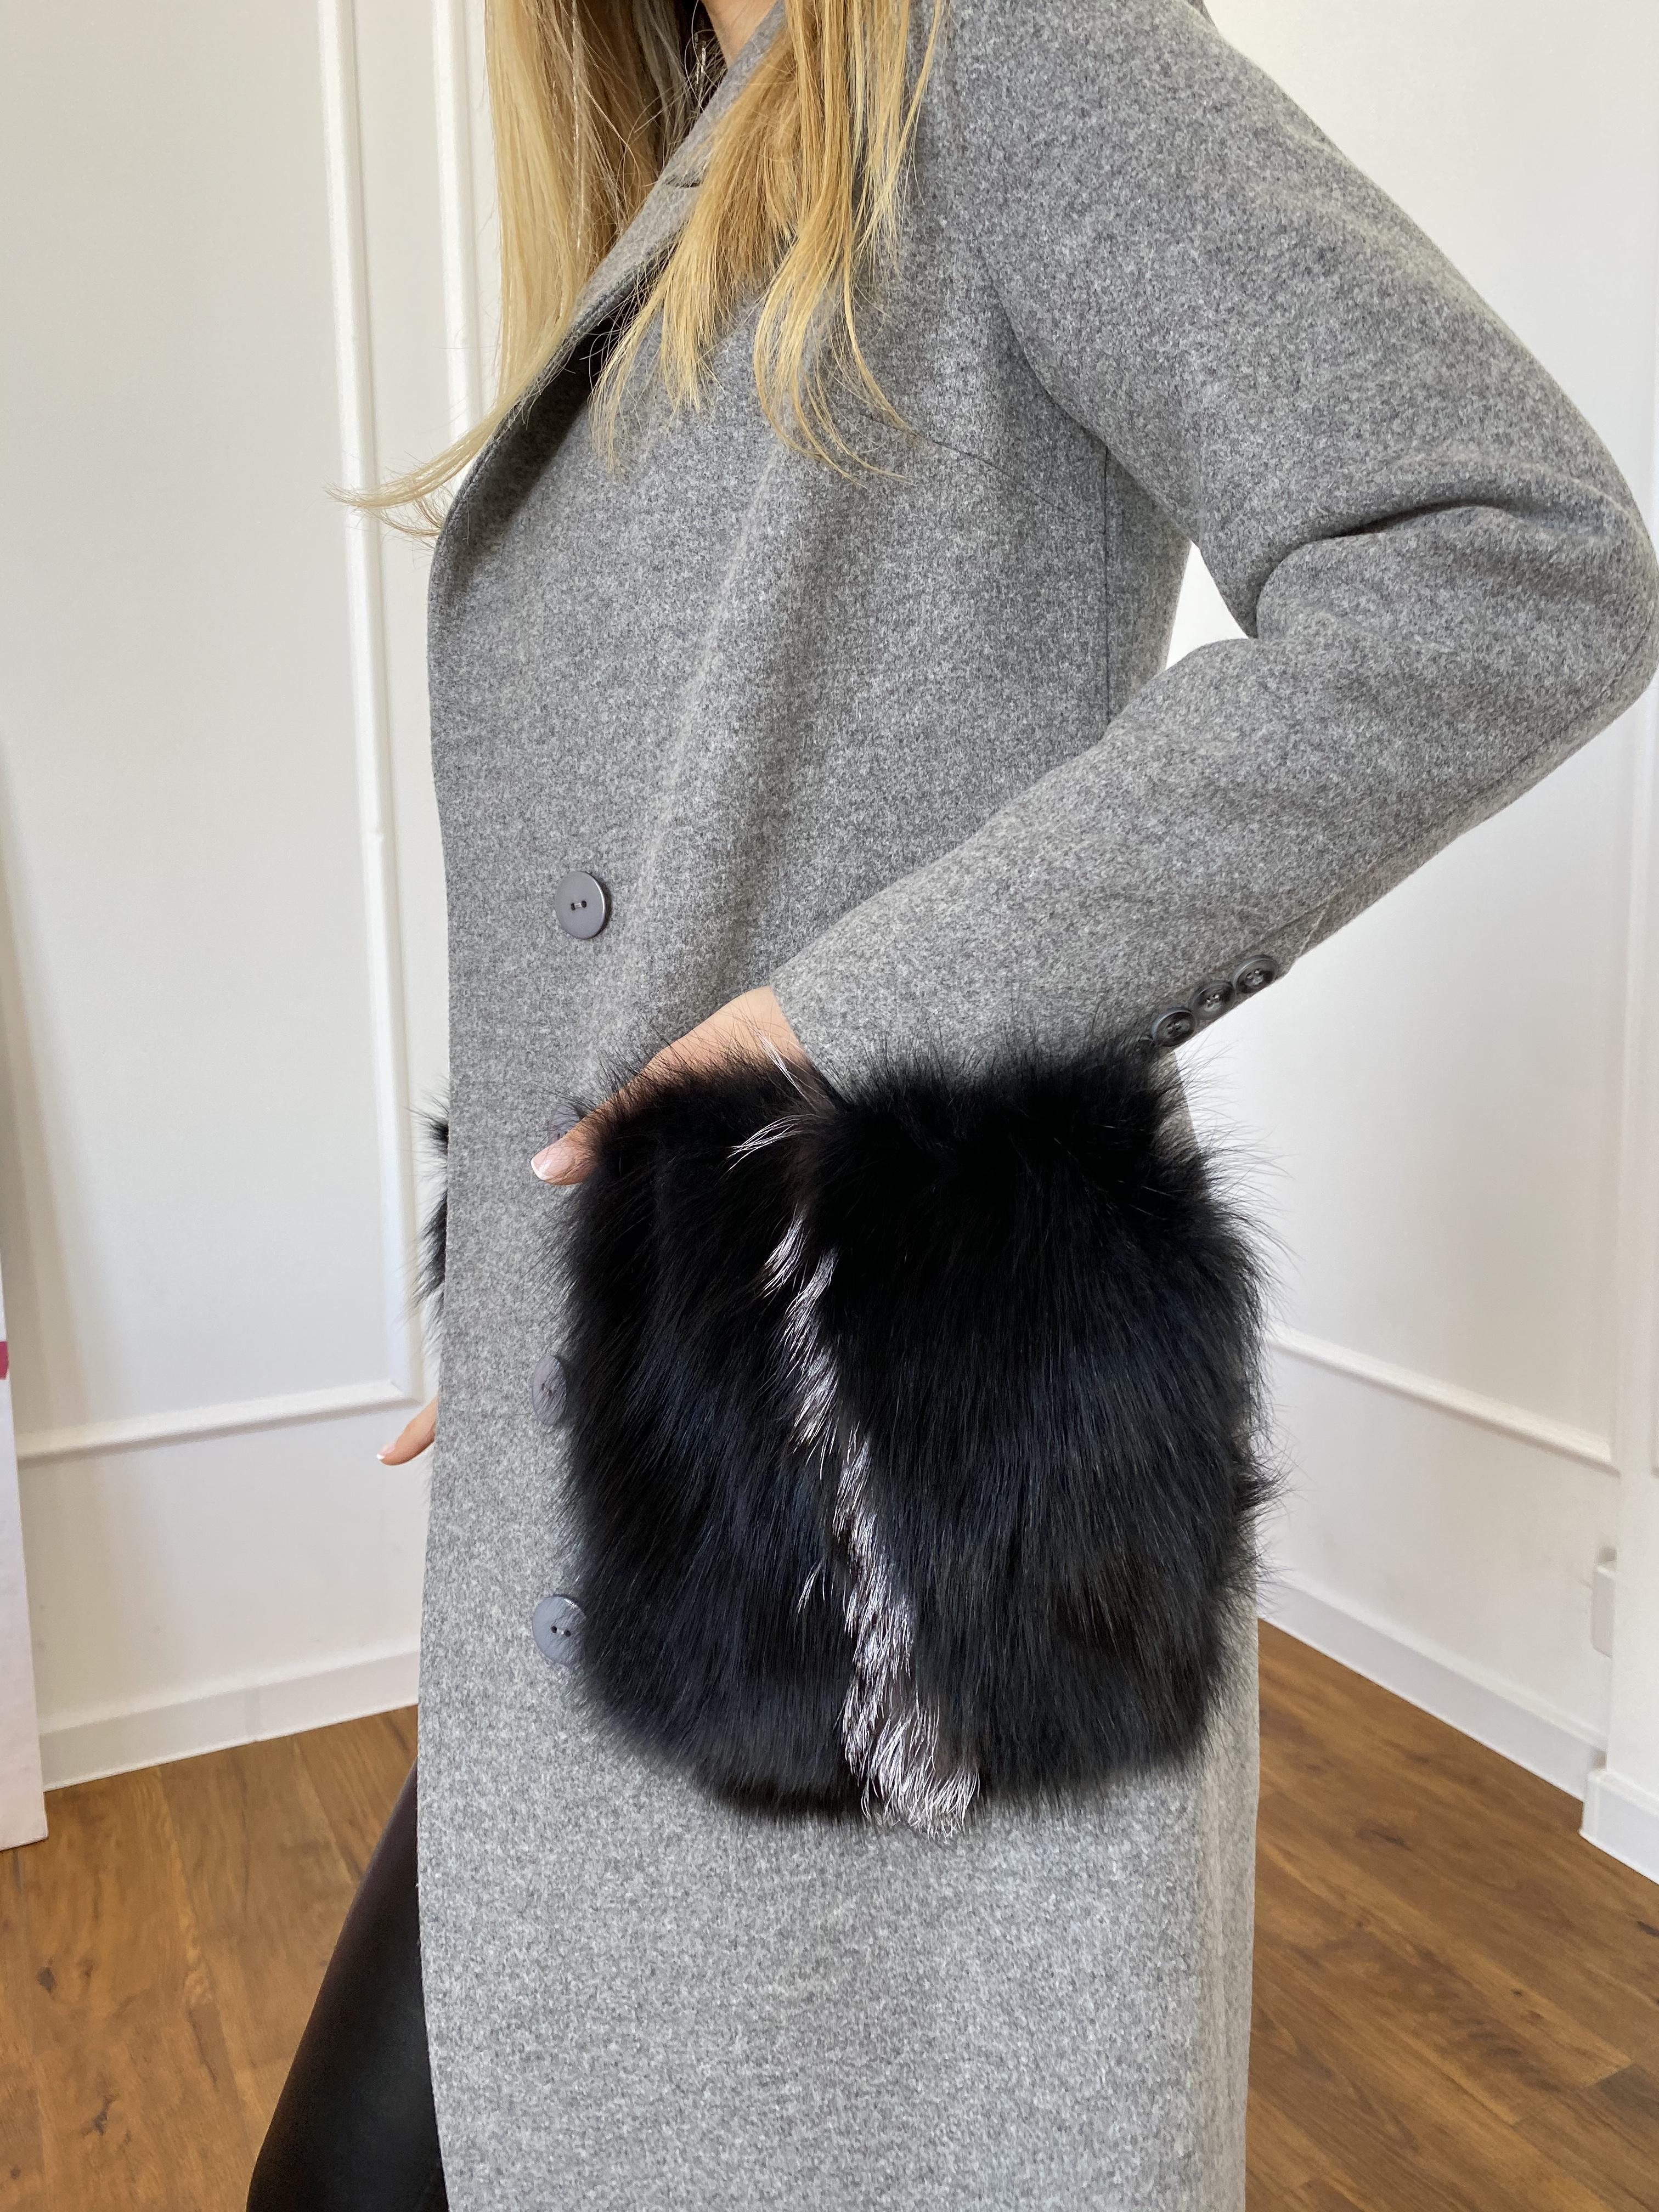 Пальто Батида 8528 АРТ. 44849 Цвет: Серый - фото 5, интернет магазин tm-modus.ru